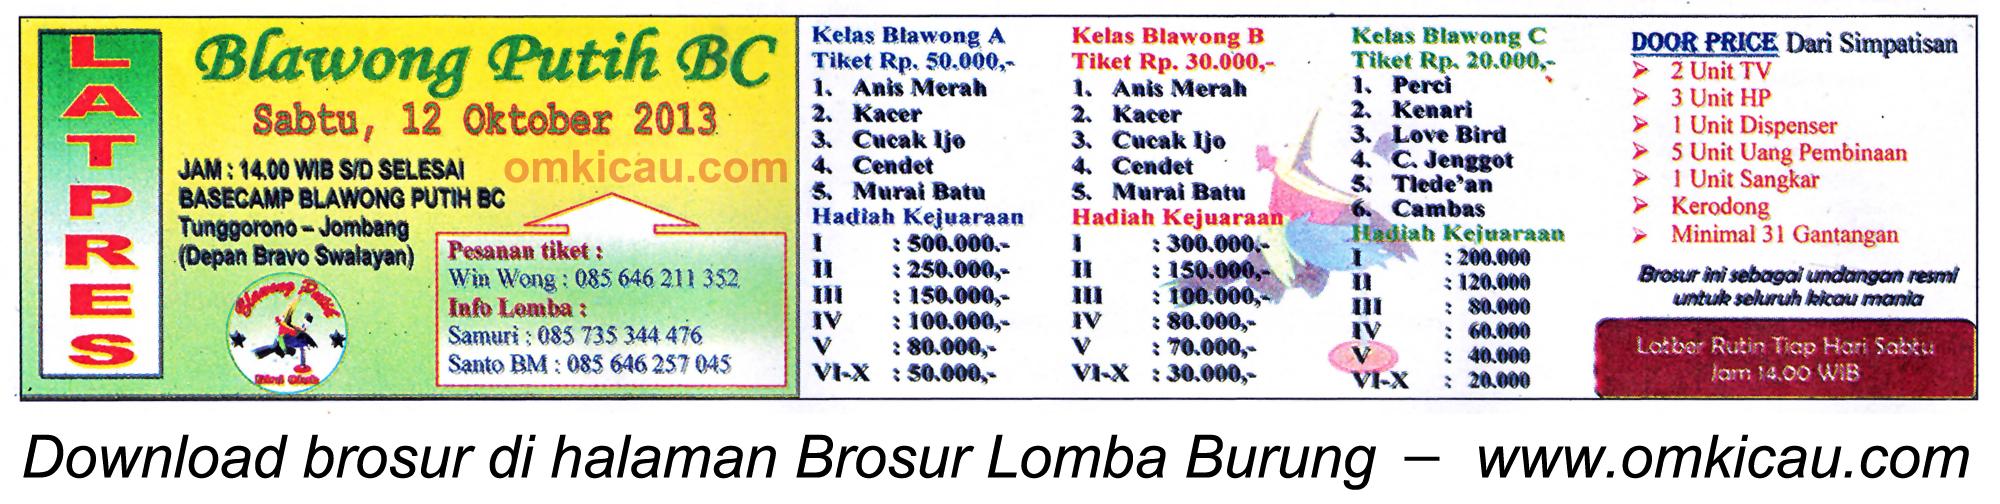 Brosur Latpres Blawong Putih BC, Jombang, 12 Oktober 2013